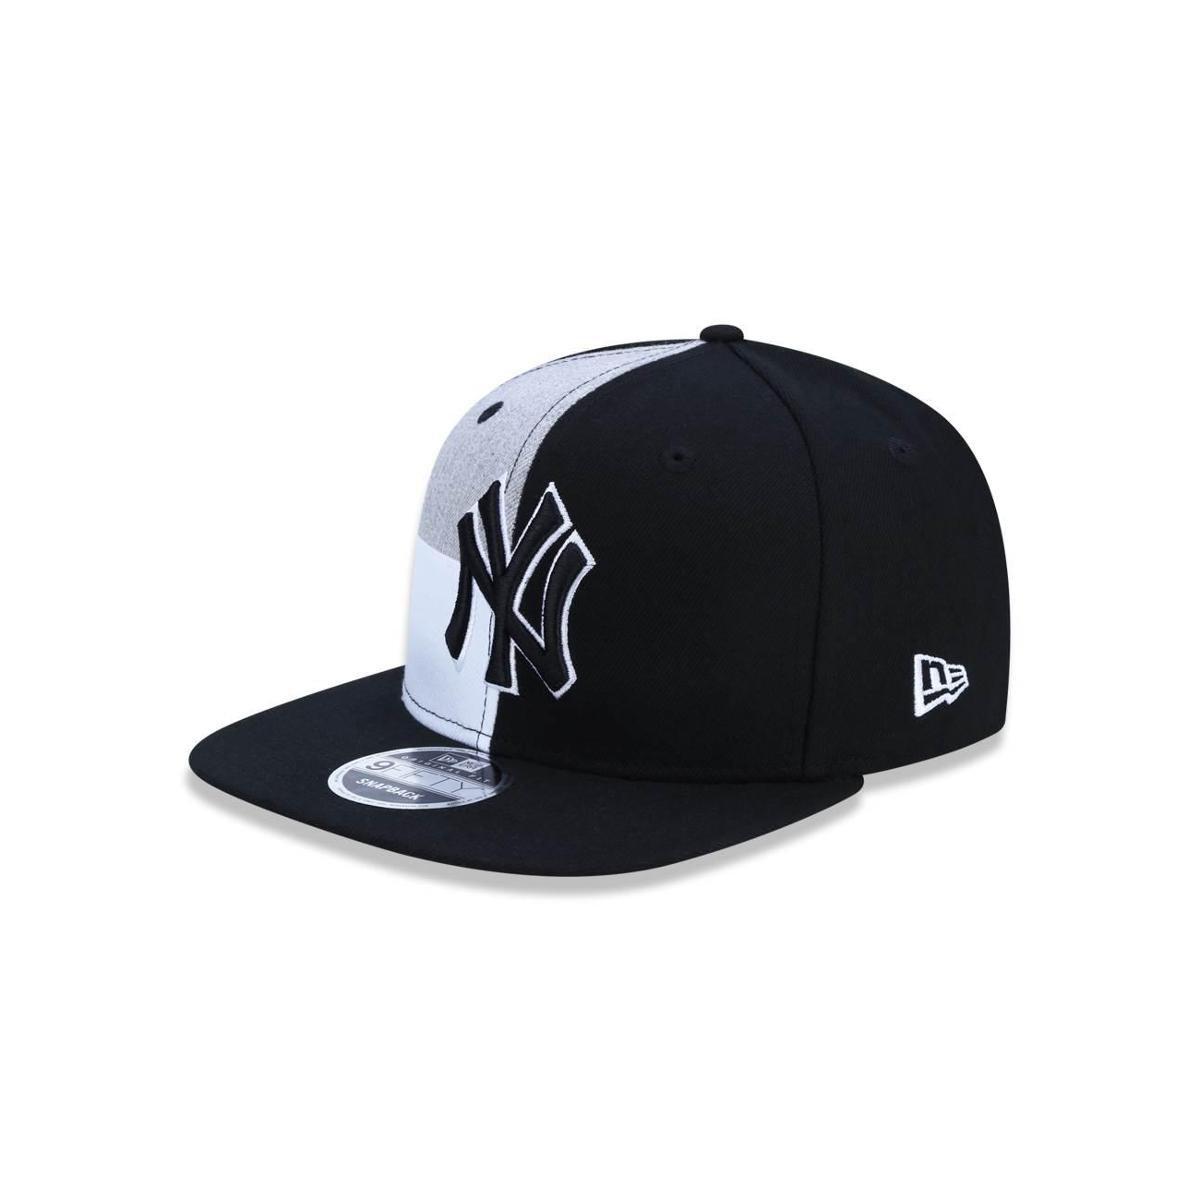 Bone 950 Original Fit New York Yankees MLB Aba Reta Snapback Preto Cinza New  Era - Preto e Cinza - Compre Agora  0baeee24af9